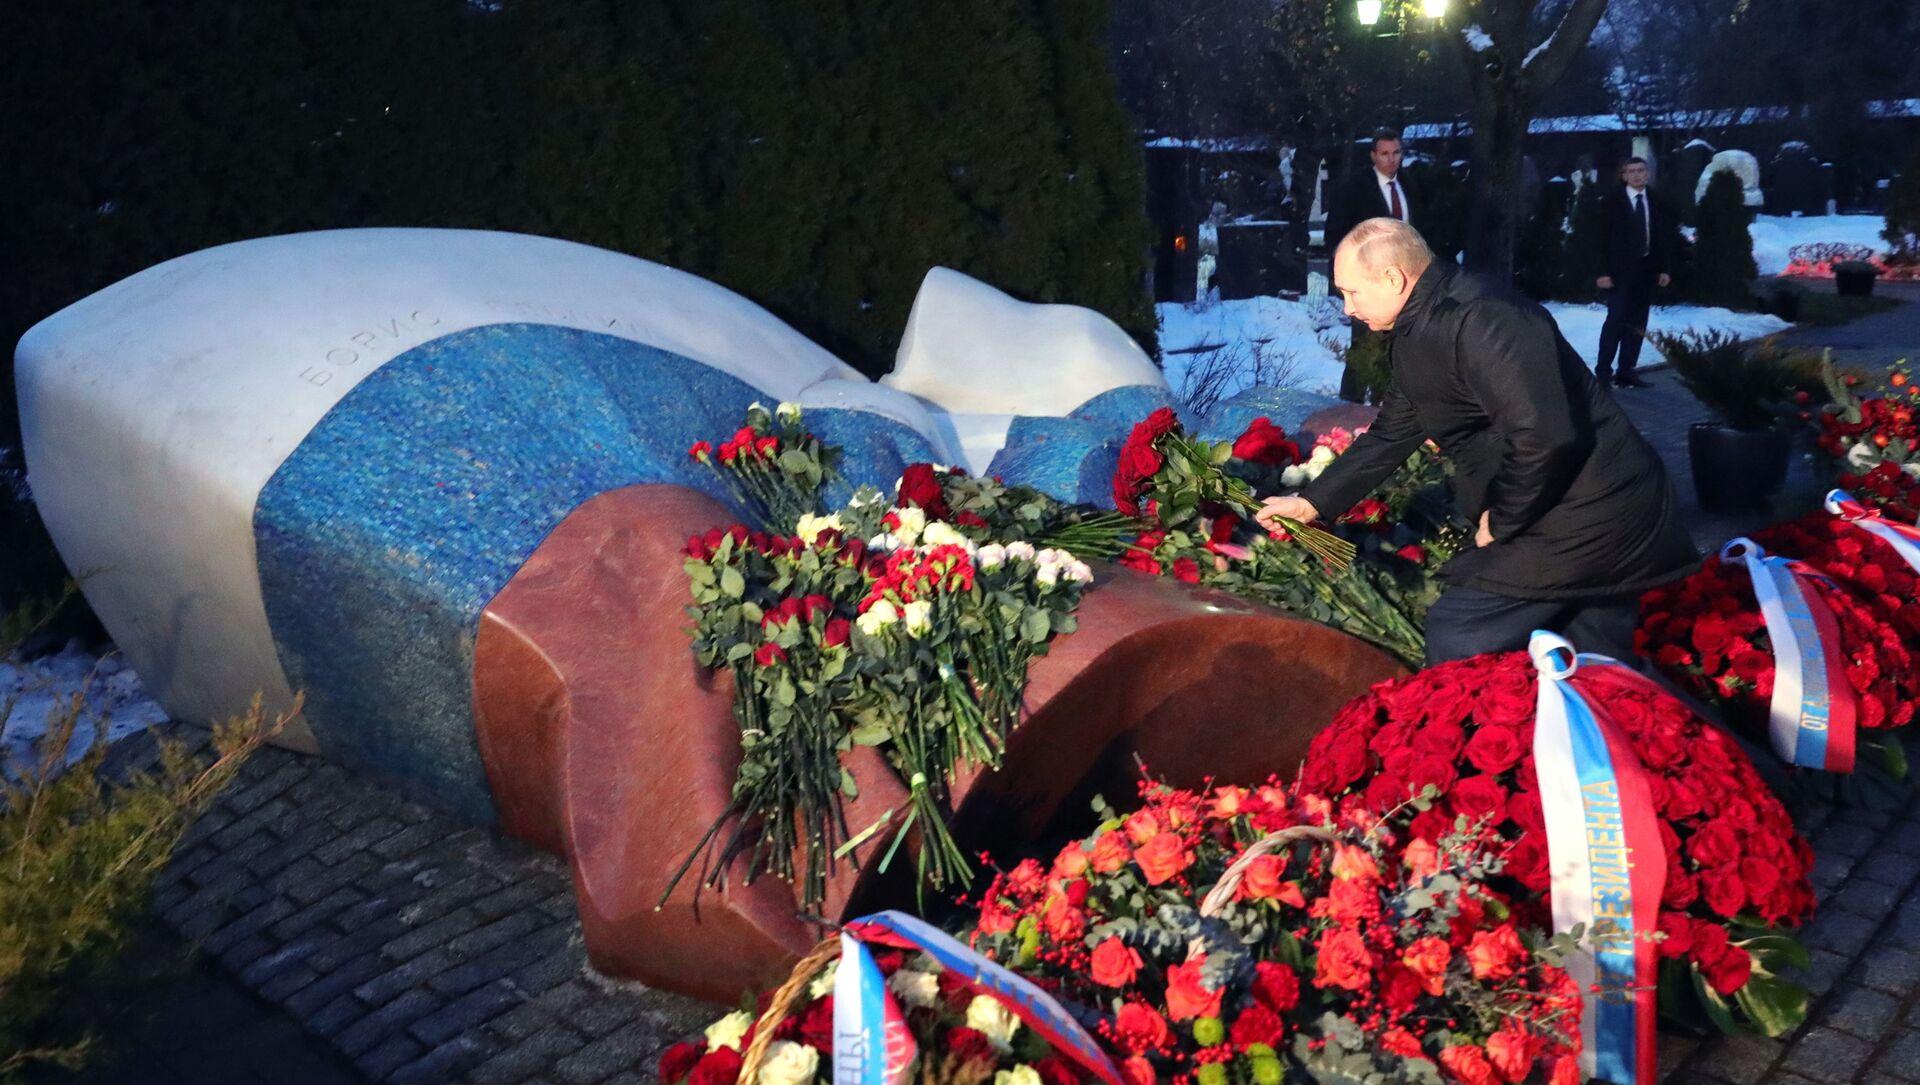 Putin ha deposto i fiori alla tomba di Eltsin  - Sputnik Italia, 1920, 01.02.2021